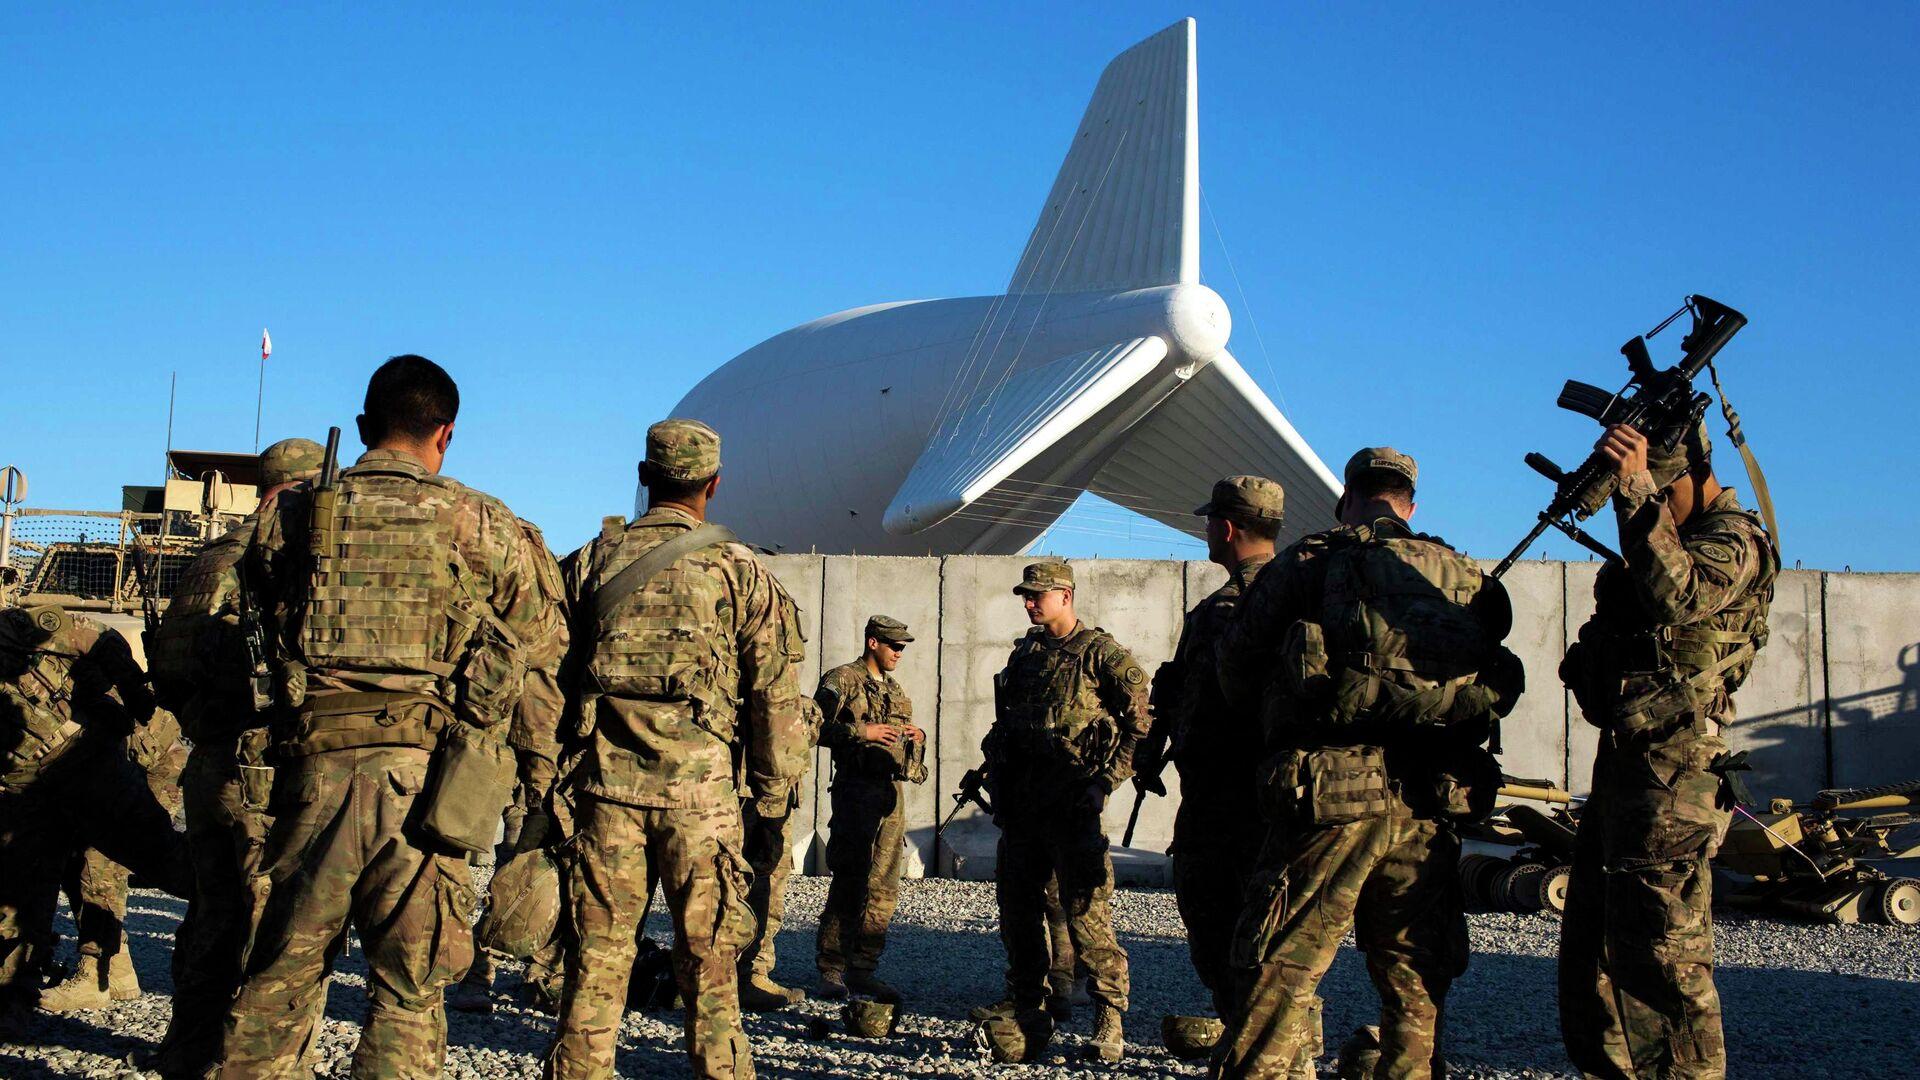 Militares de EEUU en Afganistán - Sputnik Mundo, 1920, 14.04.2021